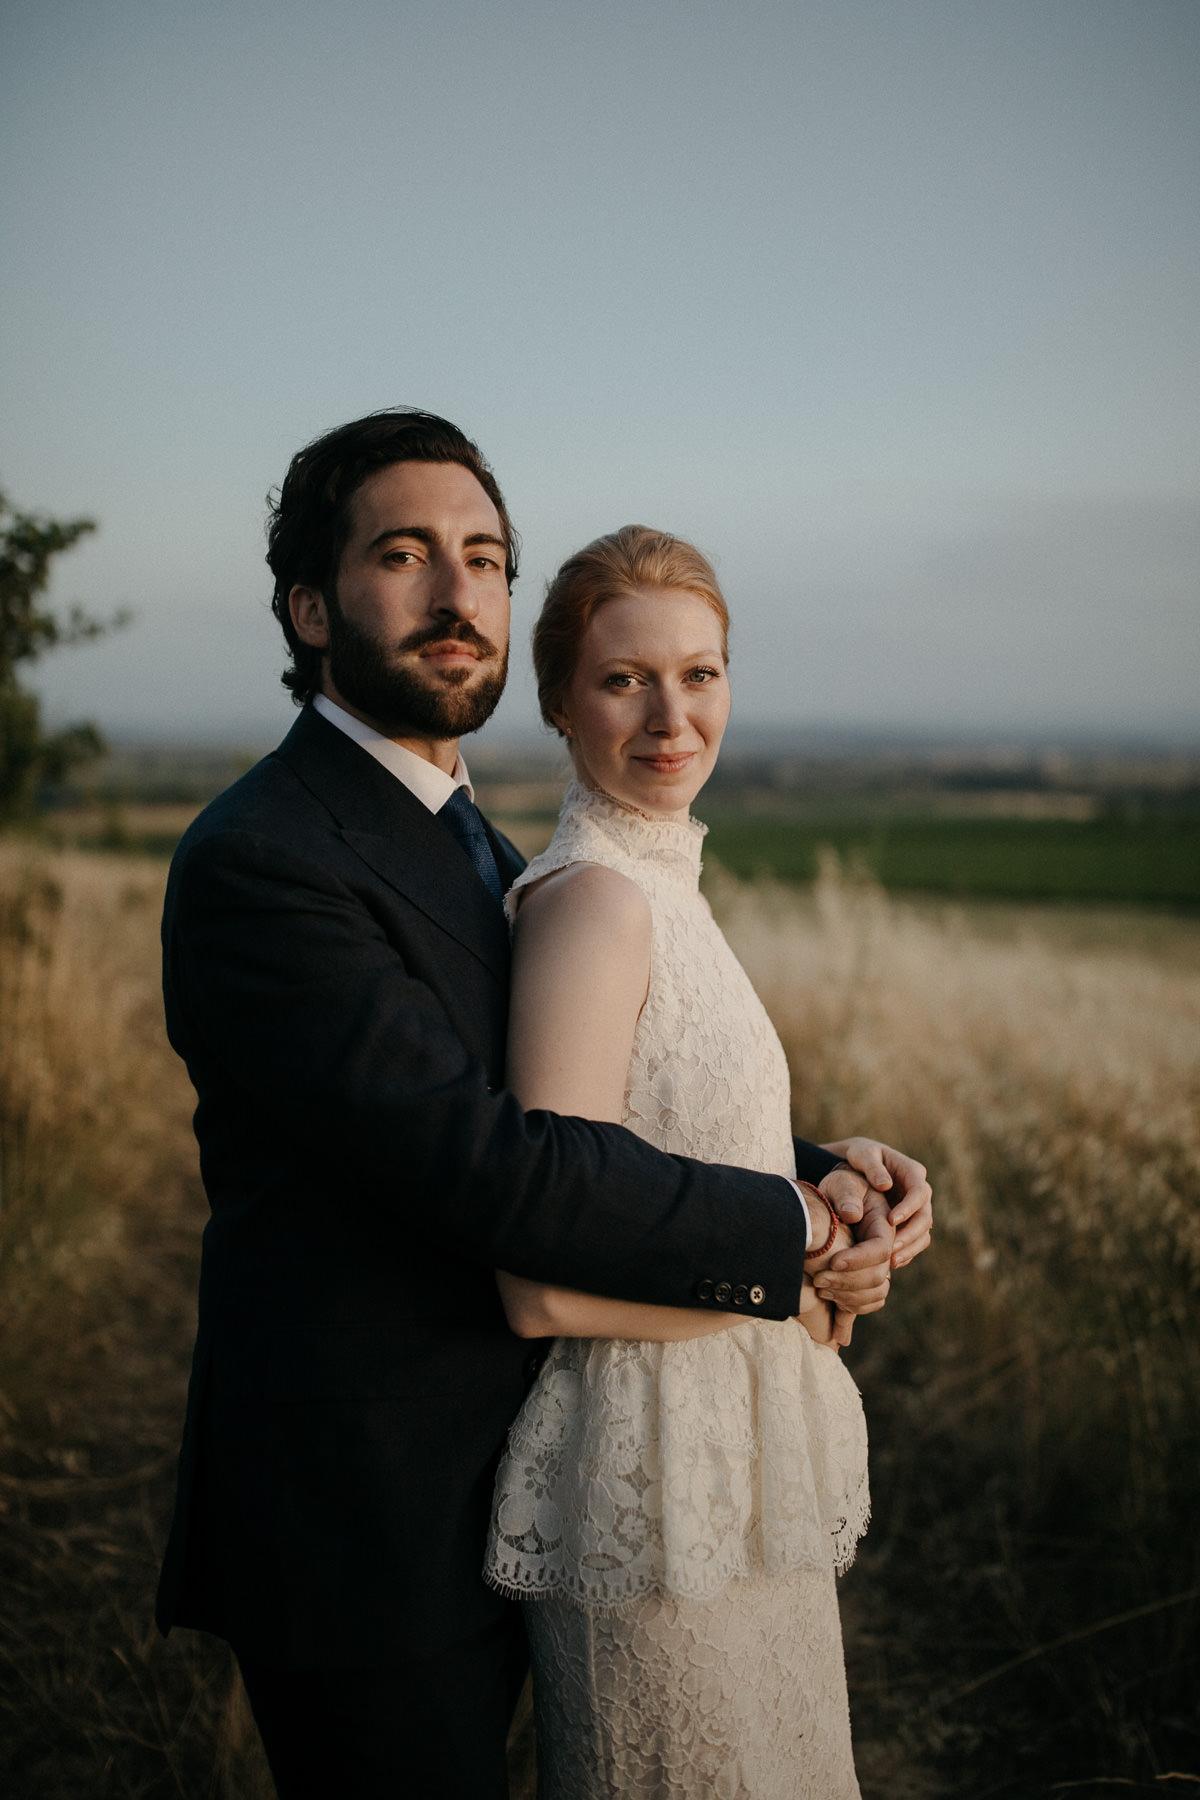 387-lifestories-photography-wedding-Frances-Jonah-2017-_MG_3143